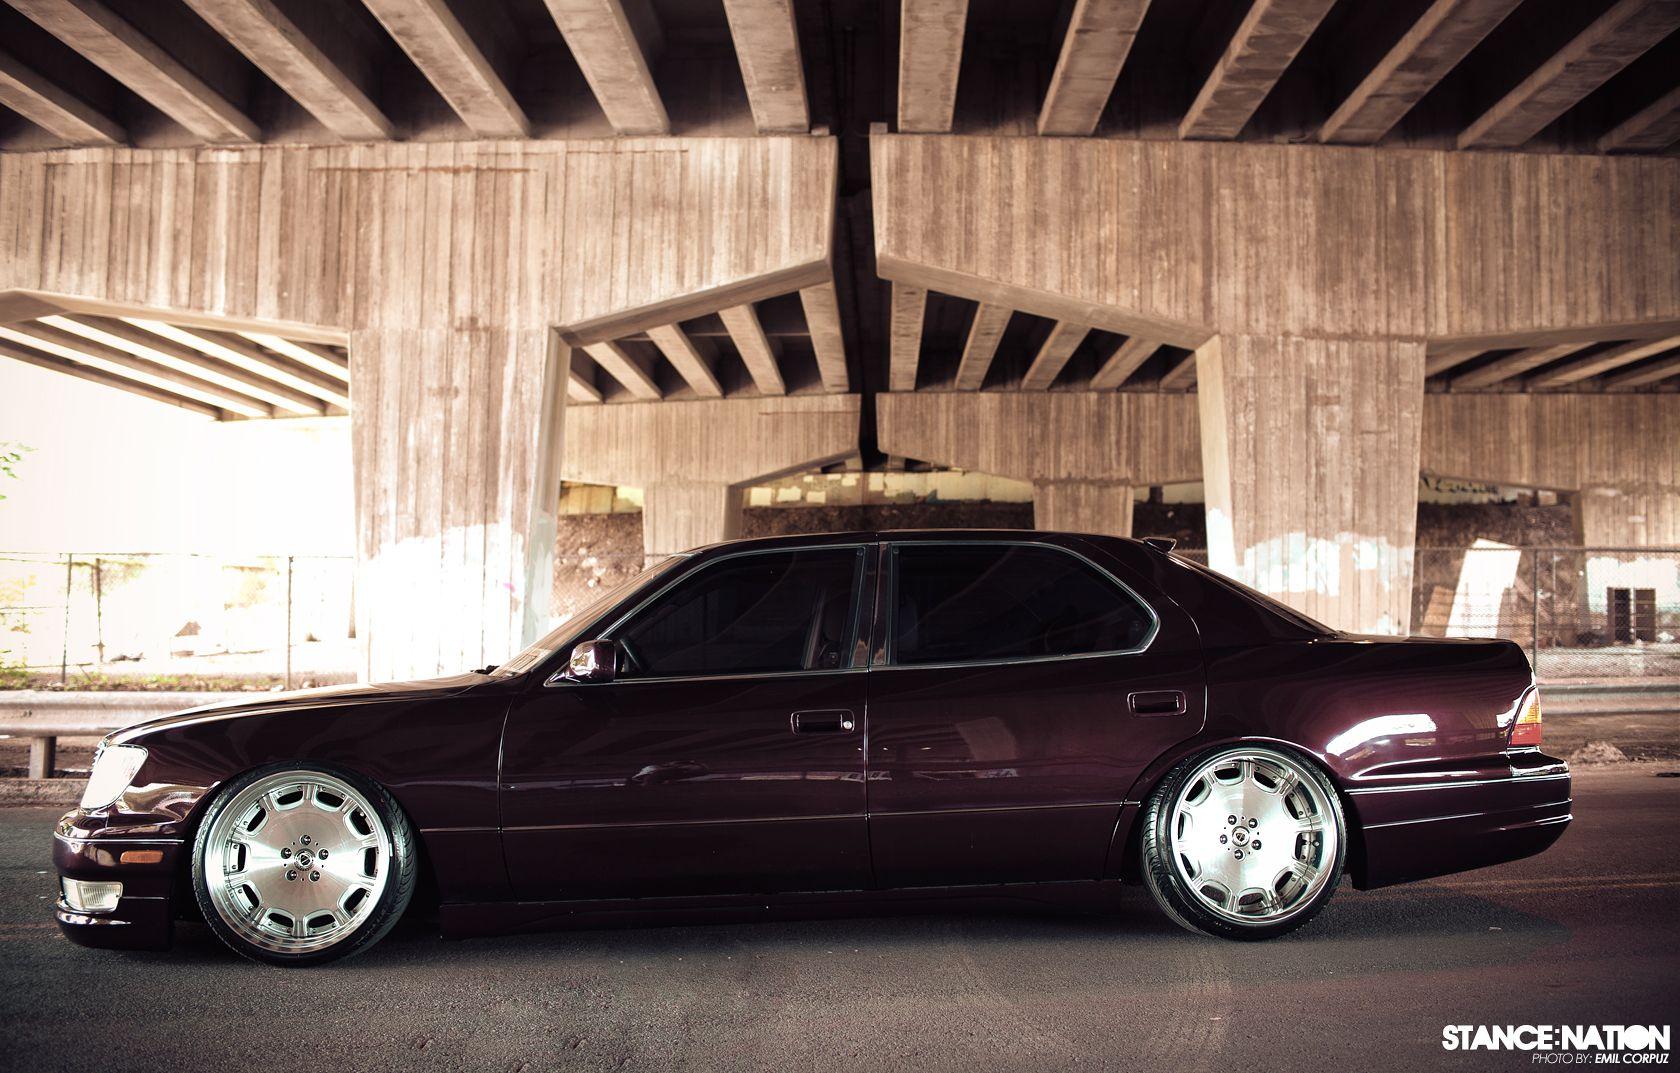 WORK rims on my Lexus LS400 @carikyoko